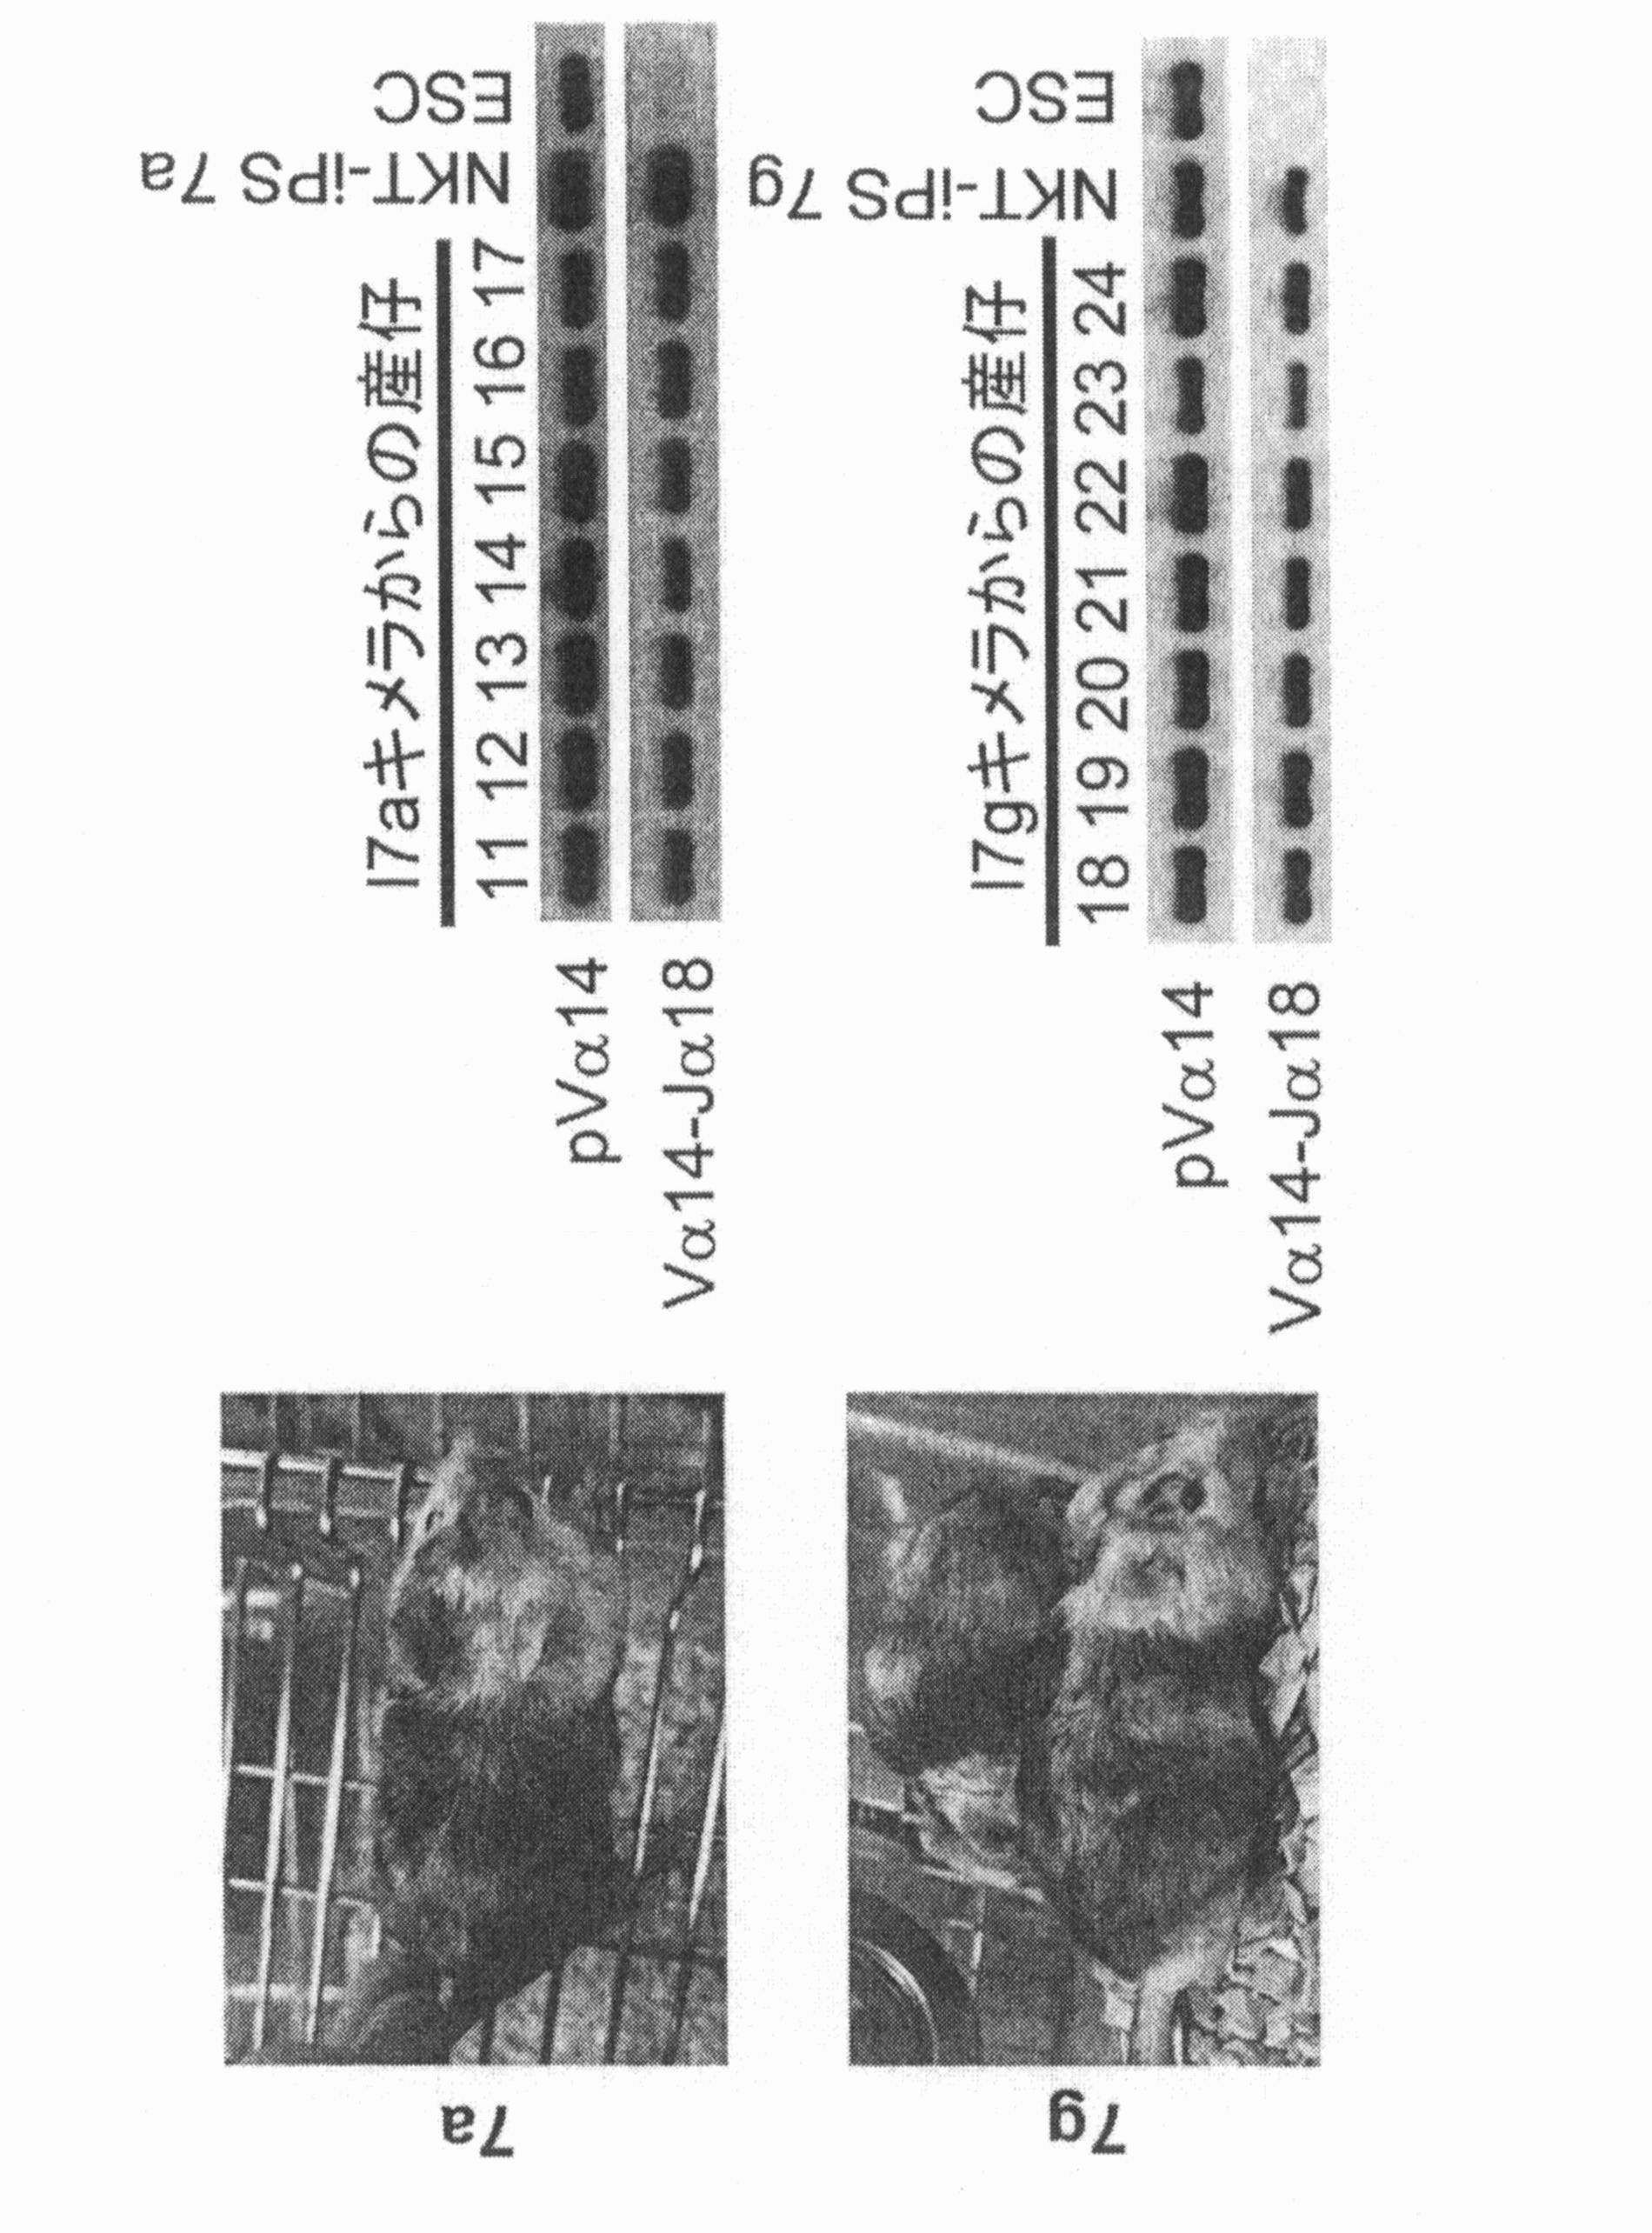 WO2012074116A1 - アロNKT細胞を用いた免疫療法およびそのためのT細胞抗原受容体(TCR)遺伝子のα鎖領域が均一なVα-Jαに再構成されている細胞および該細胞由来NKT細胞のバンキング         - Google PatentsFamily